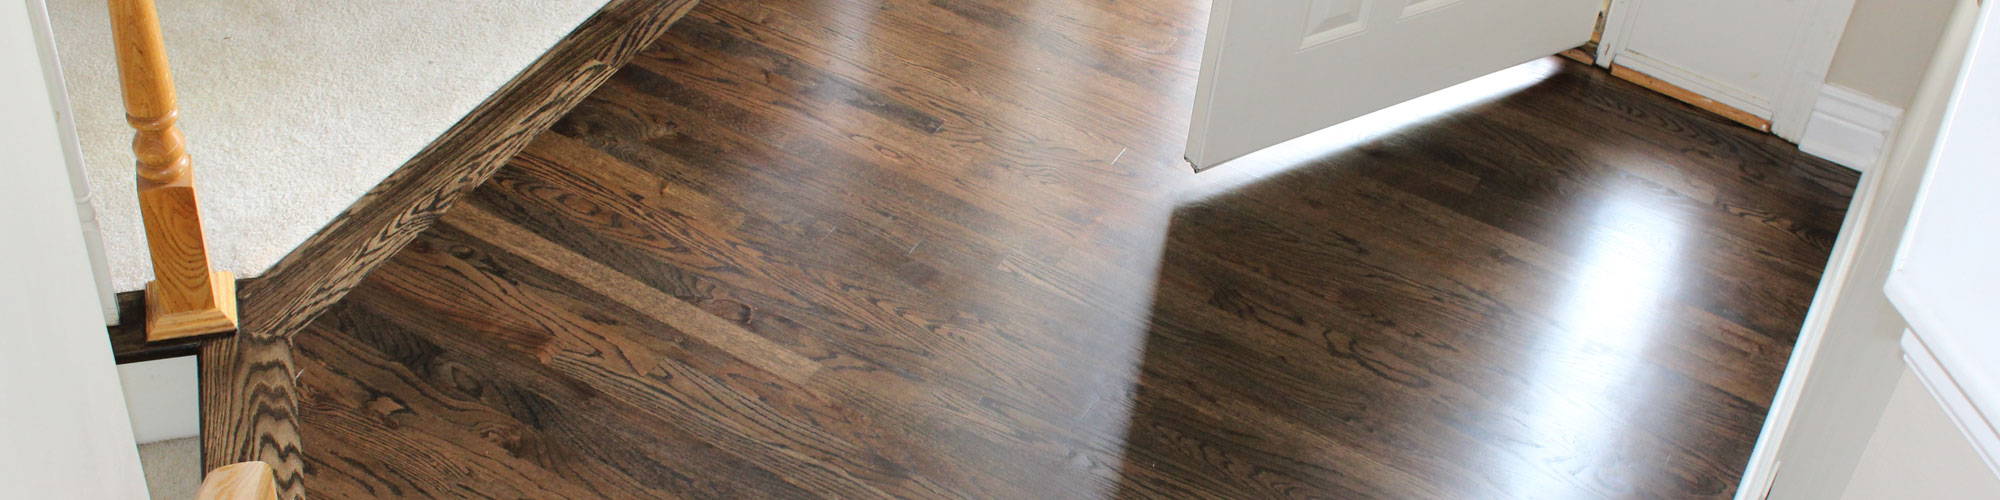 hardwood floor refinishing dark stain